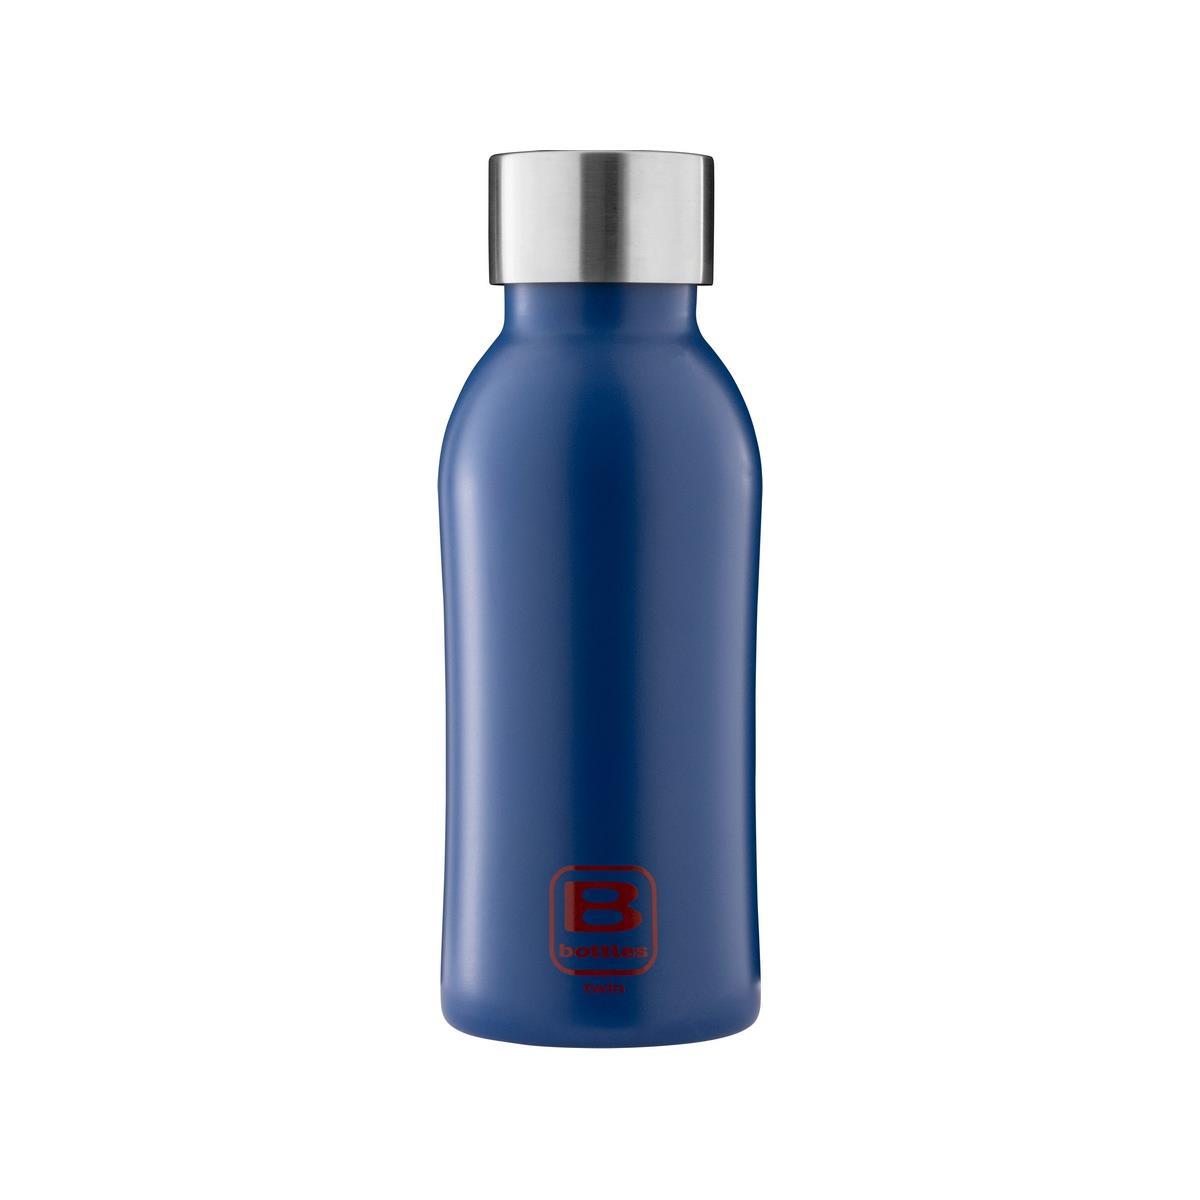 B Bottles Twin - Classic Blue - 350 ml - Bottiglia Termica a doppia parete in acciaio inox 18/10